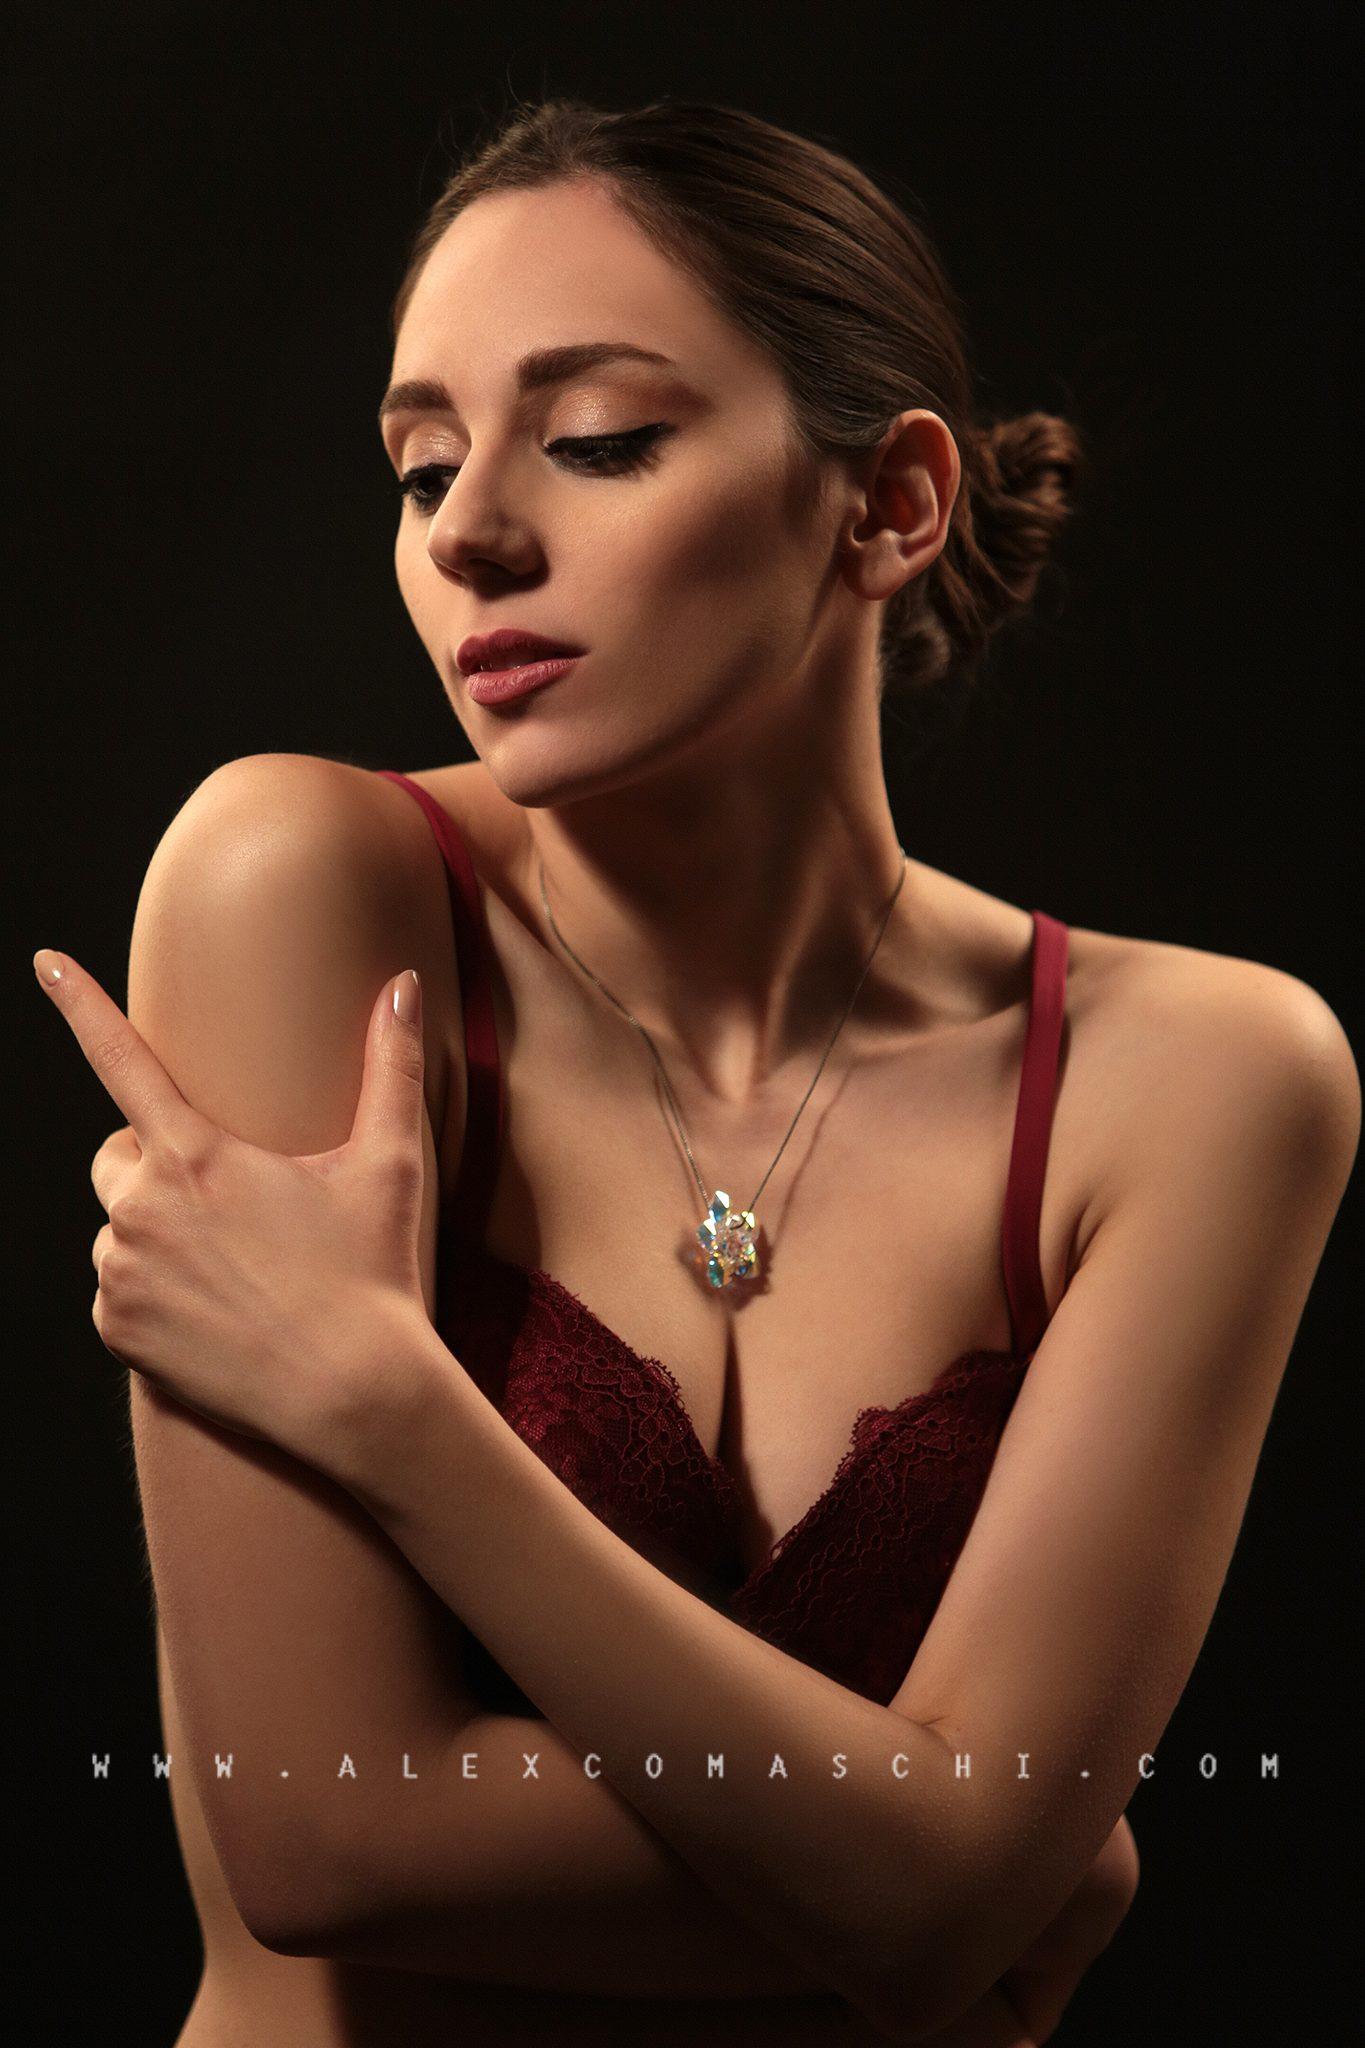 Valeria Manni by Alex Comaschi